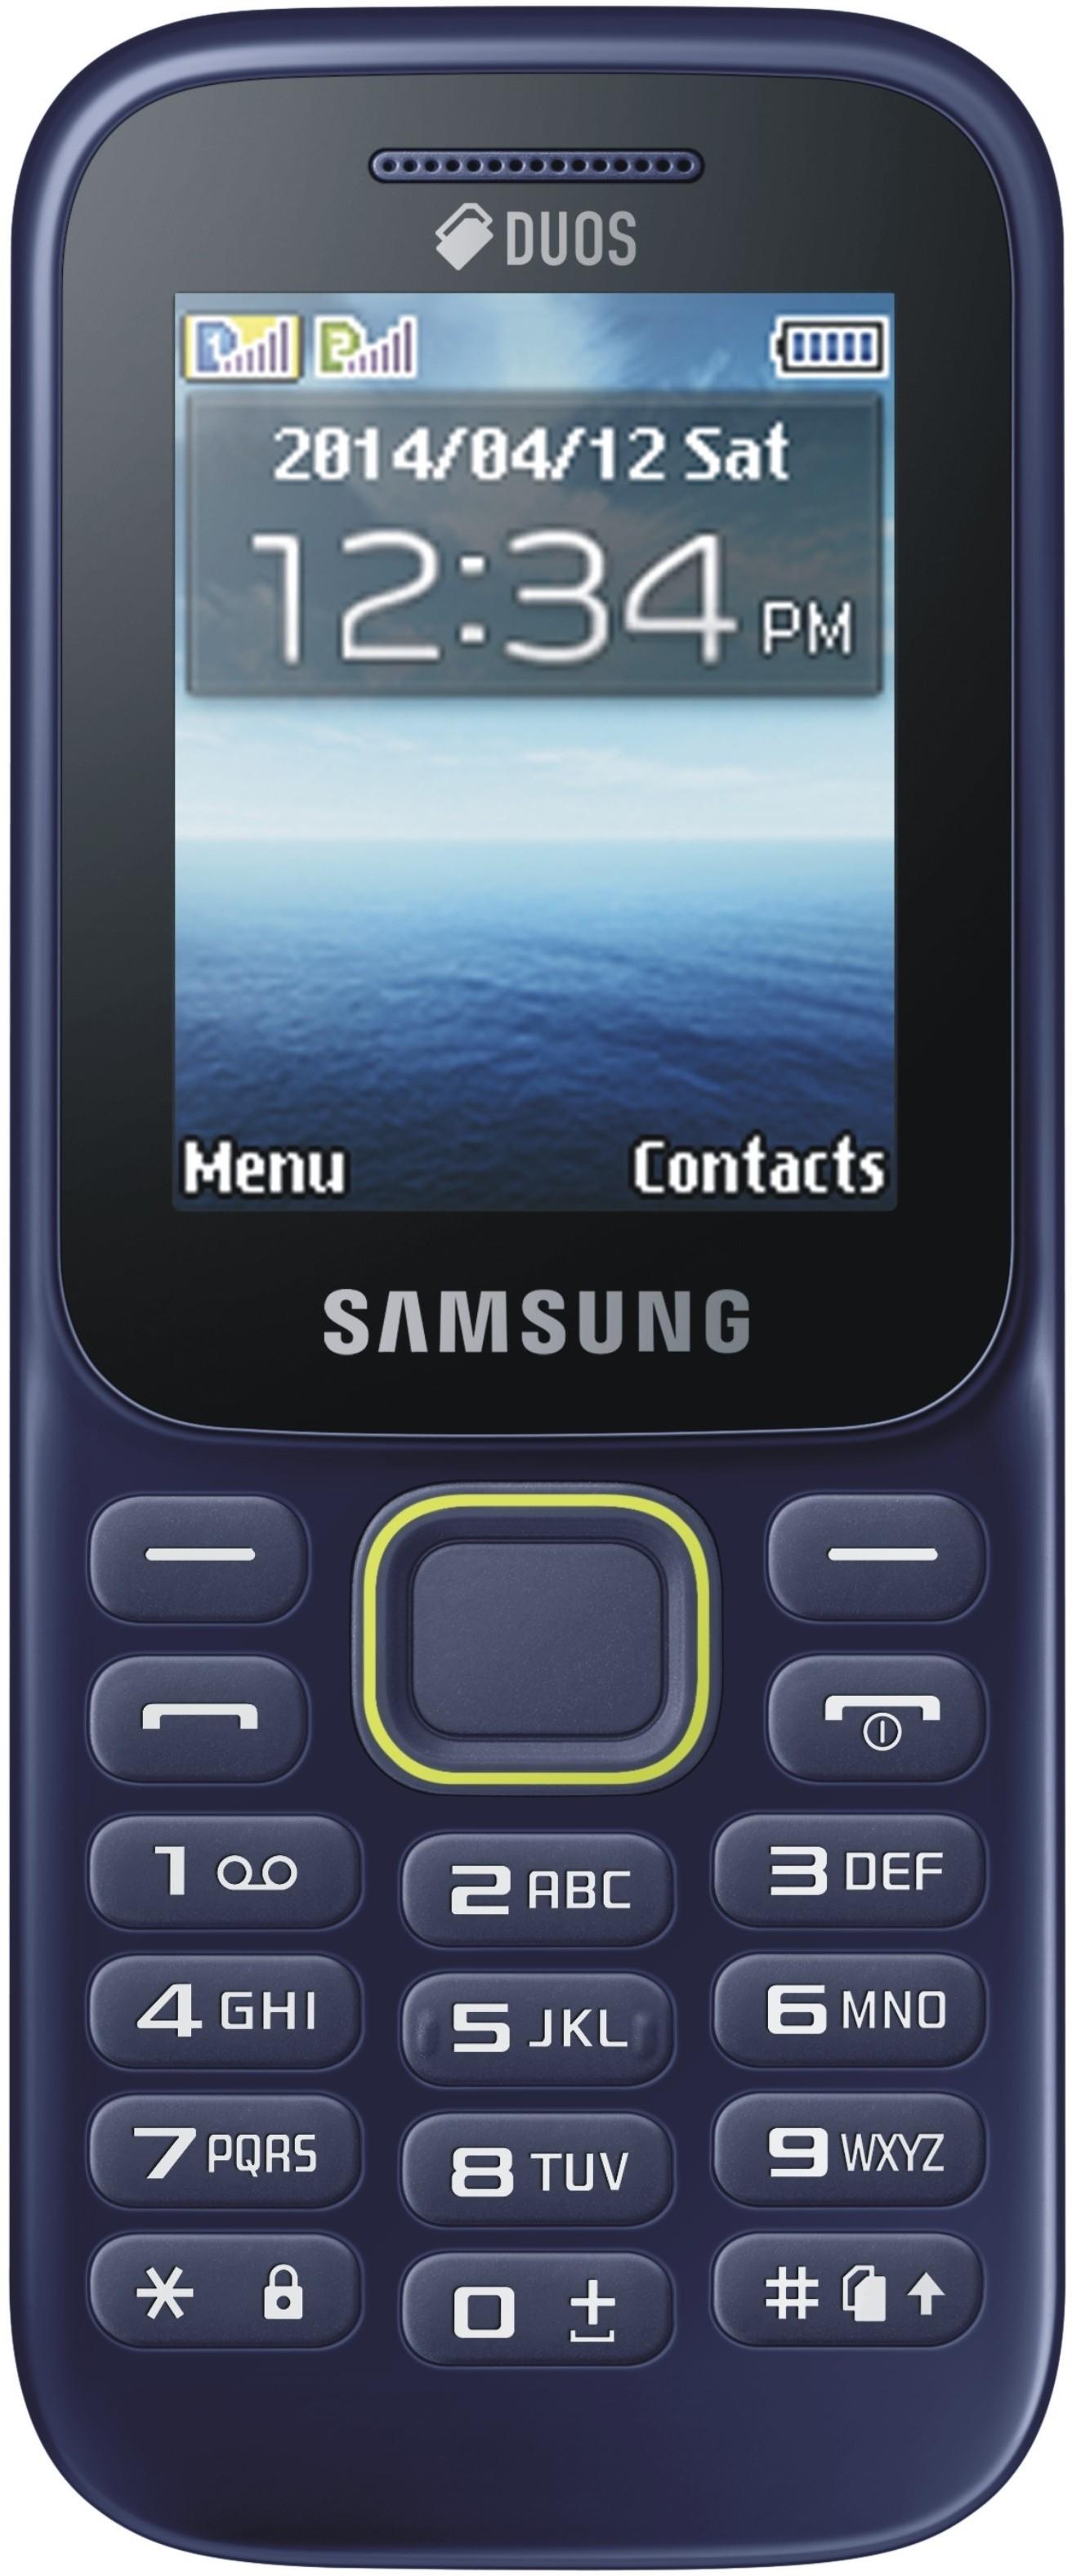 Samsung Mobile Price List 4 May 2018 Latest 9335544 Guru Music 2 Piton Sm B310e White